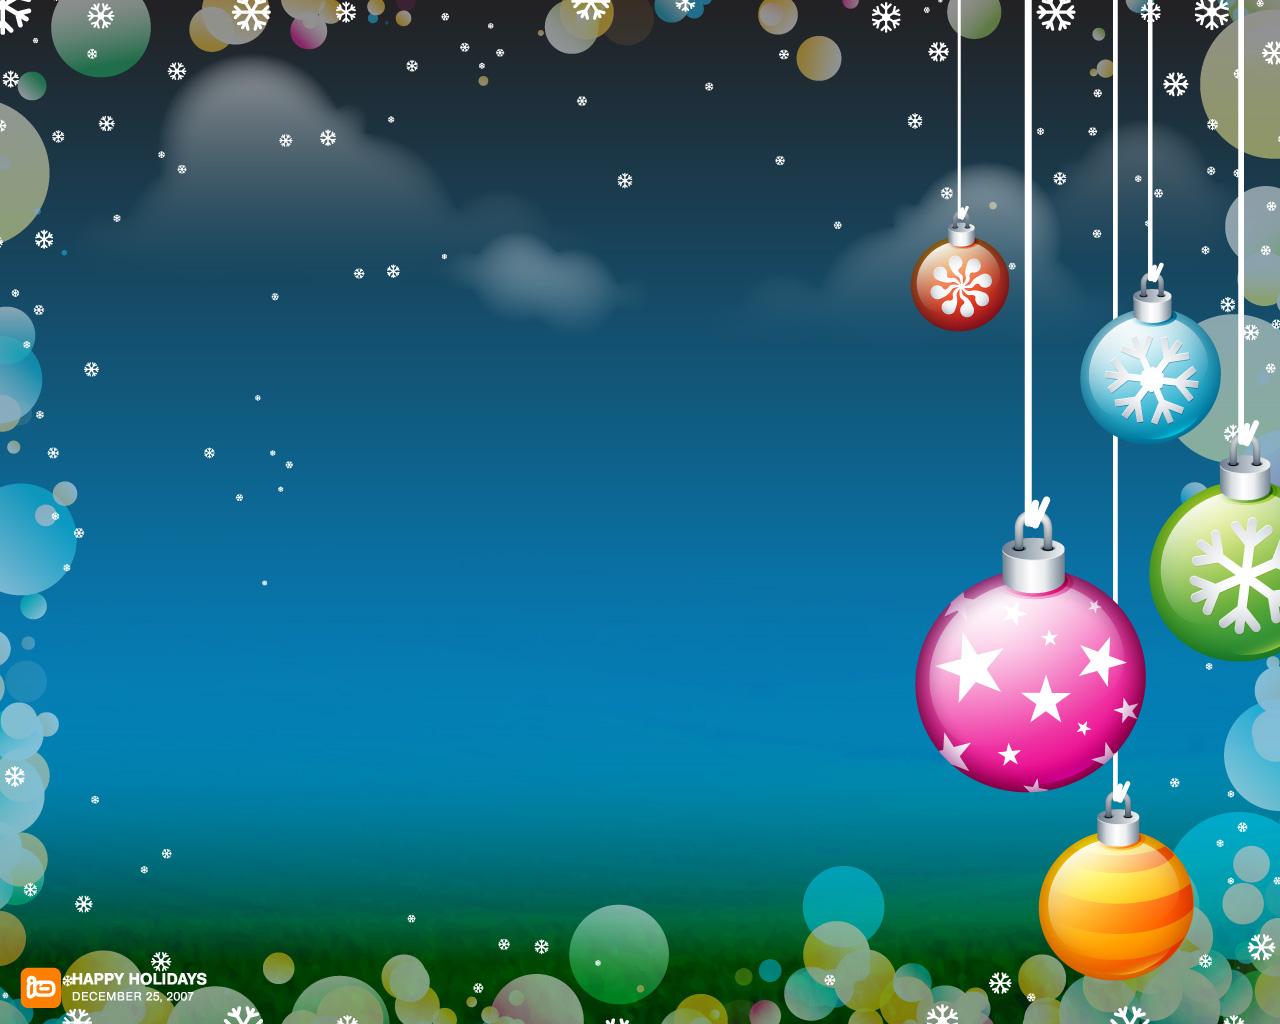 http://1.bp.blogspot.com/-JpVZ39NFZlk/Tuld0exMqII/AAAAAAAADsw/7vMiSViMNOI/s1600-d/Merry.Christmas.2.jpg